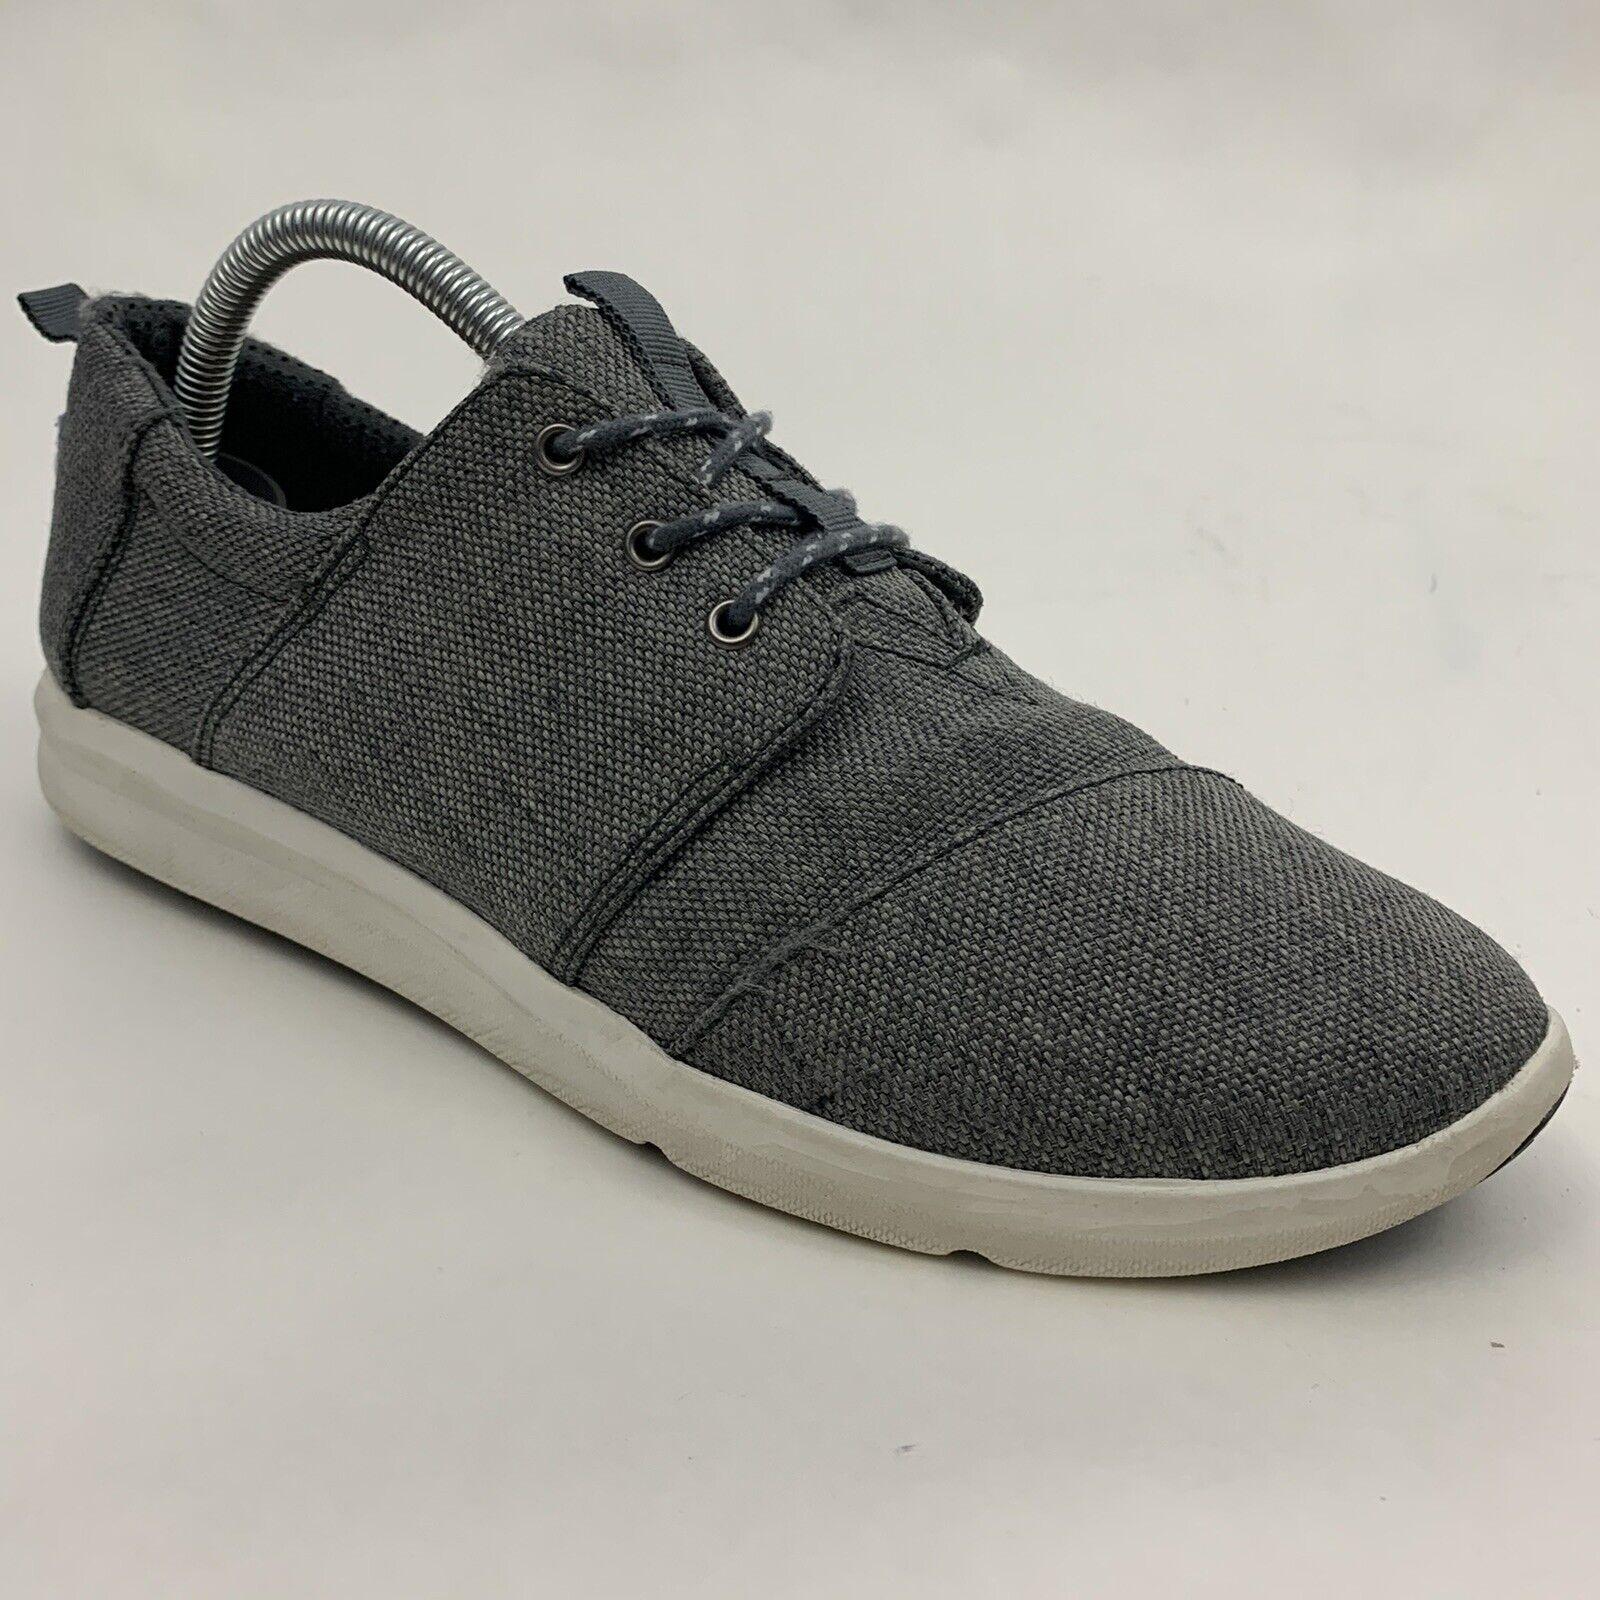 Toms Del Rey Tribal Sneaker 10 for sale